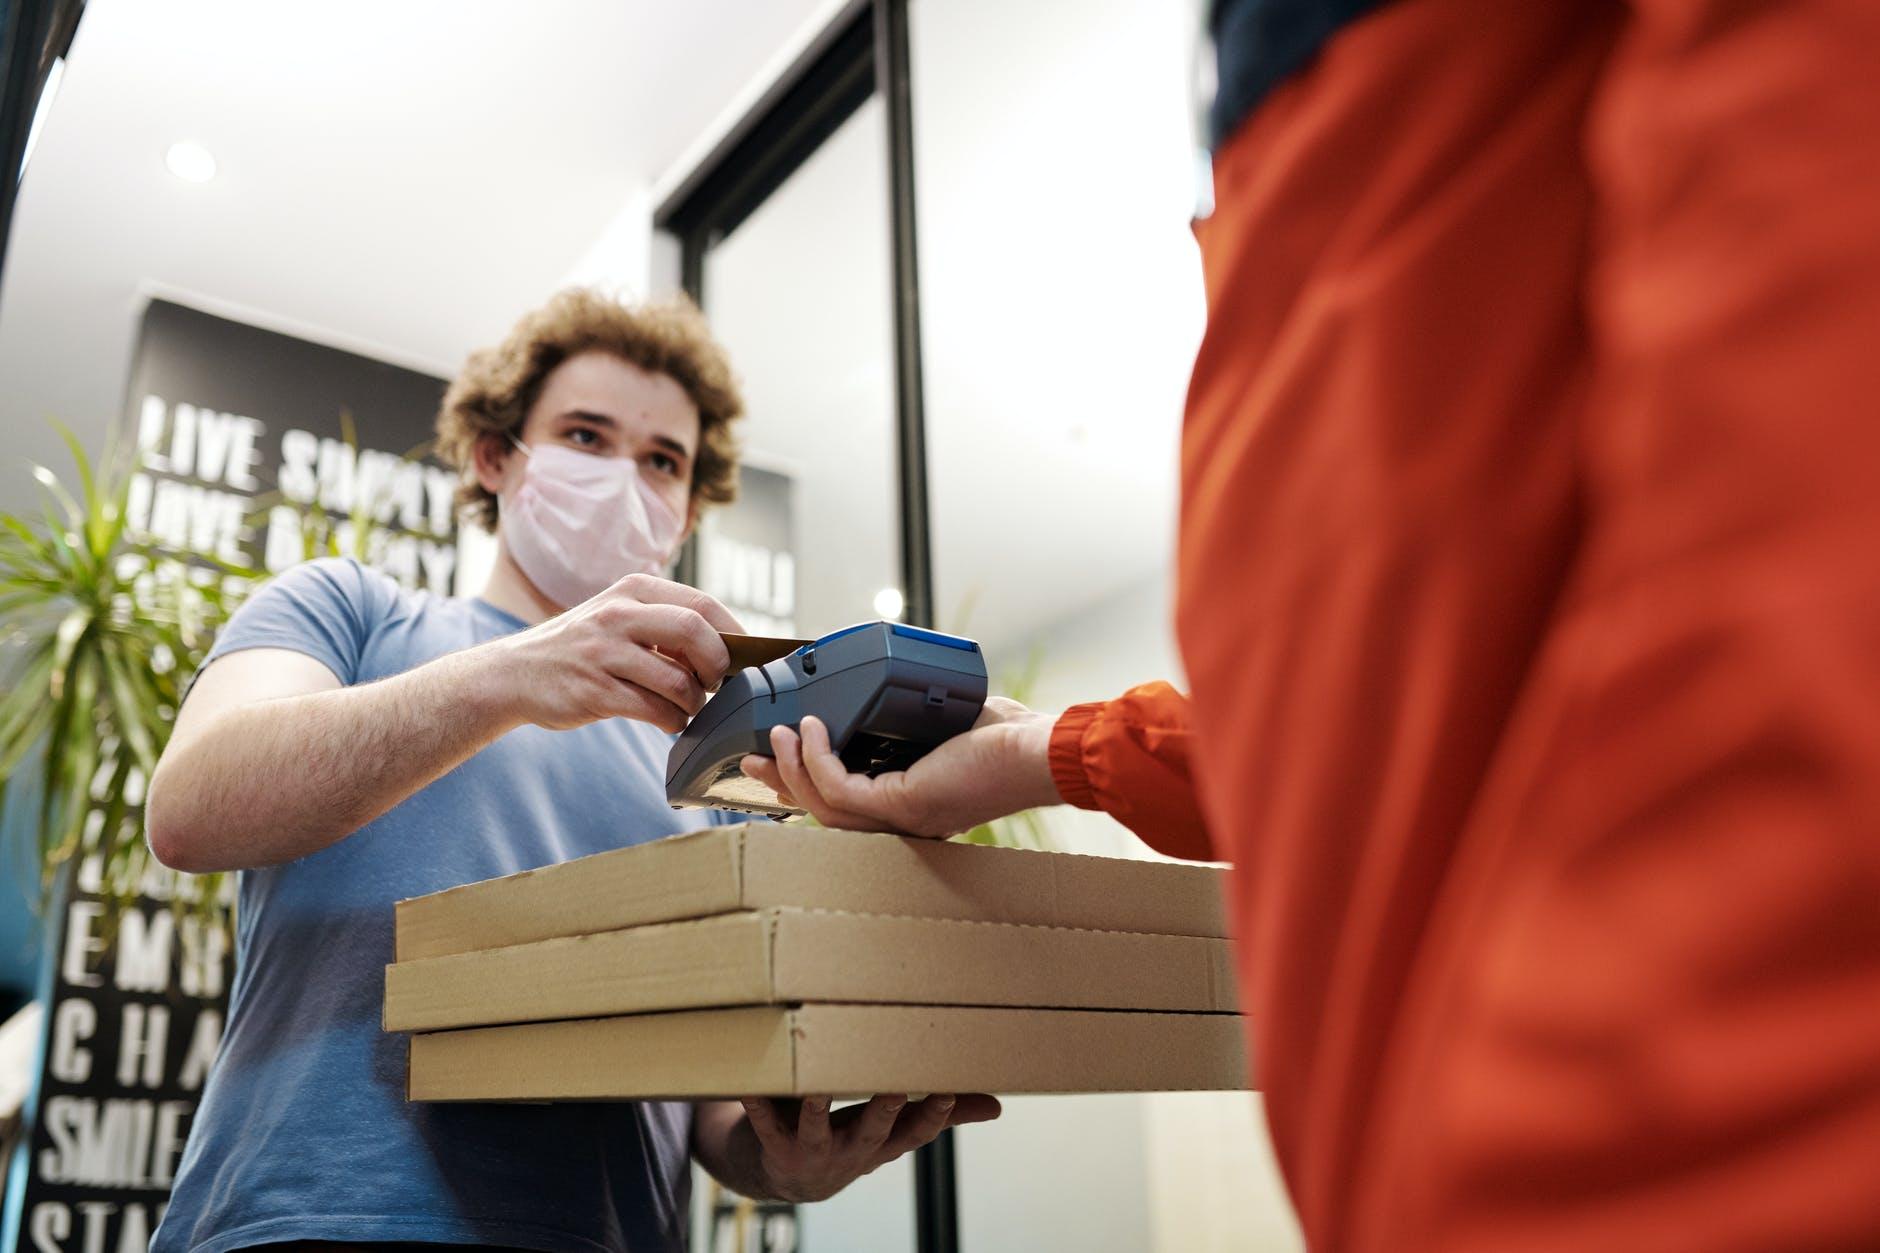 #BitcoinPizzaDay ayudará a 1.400 familias